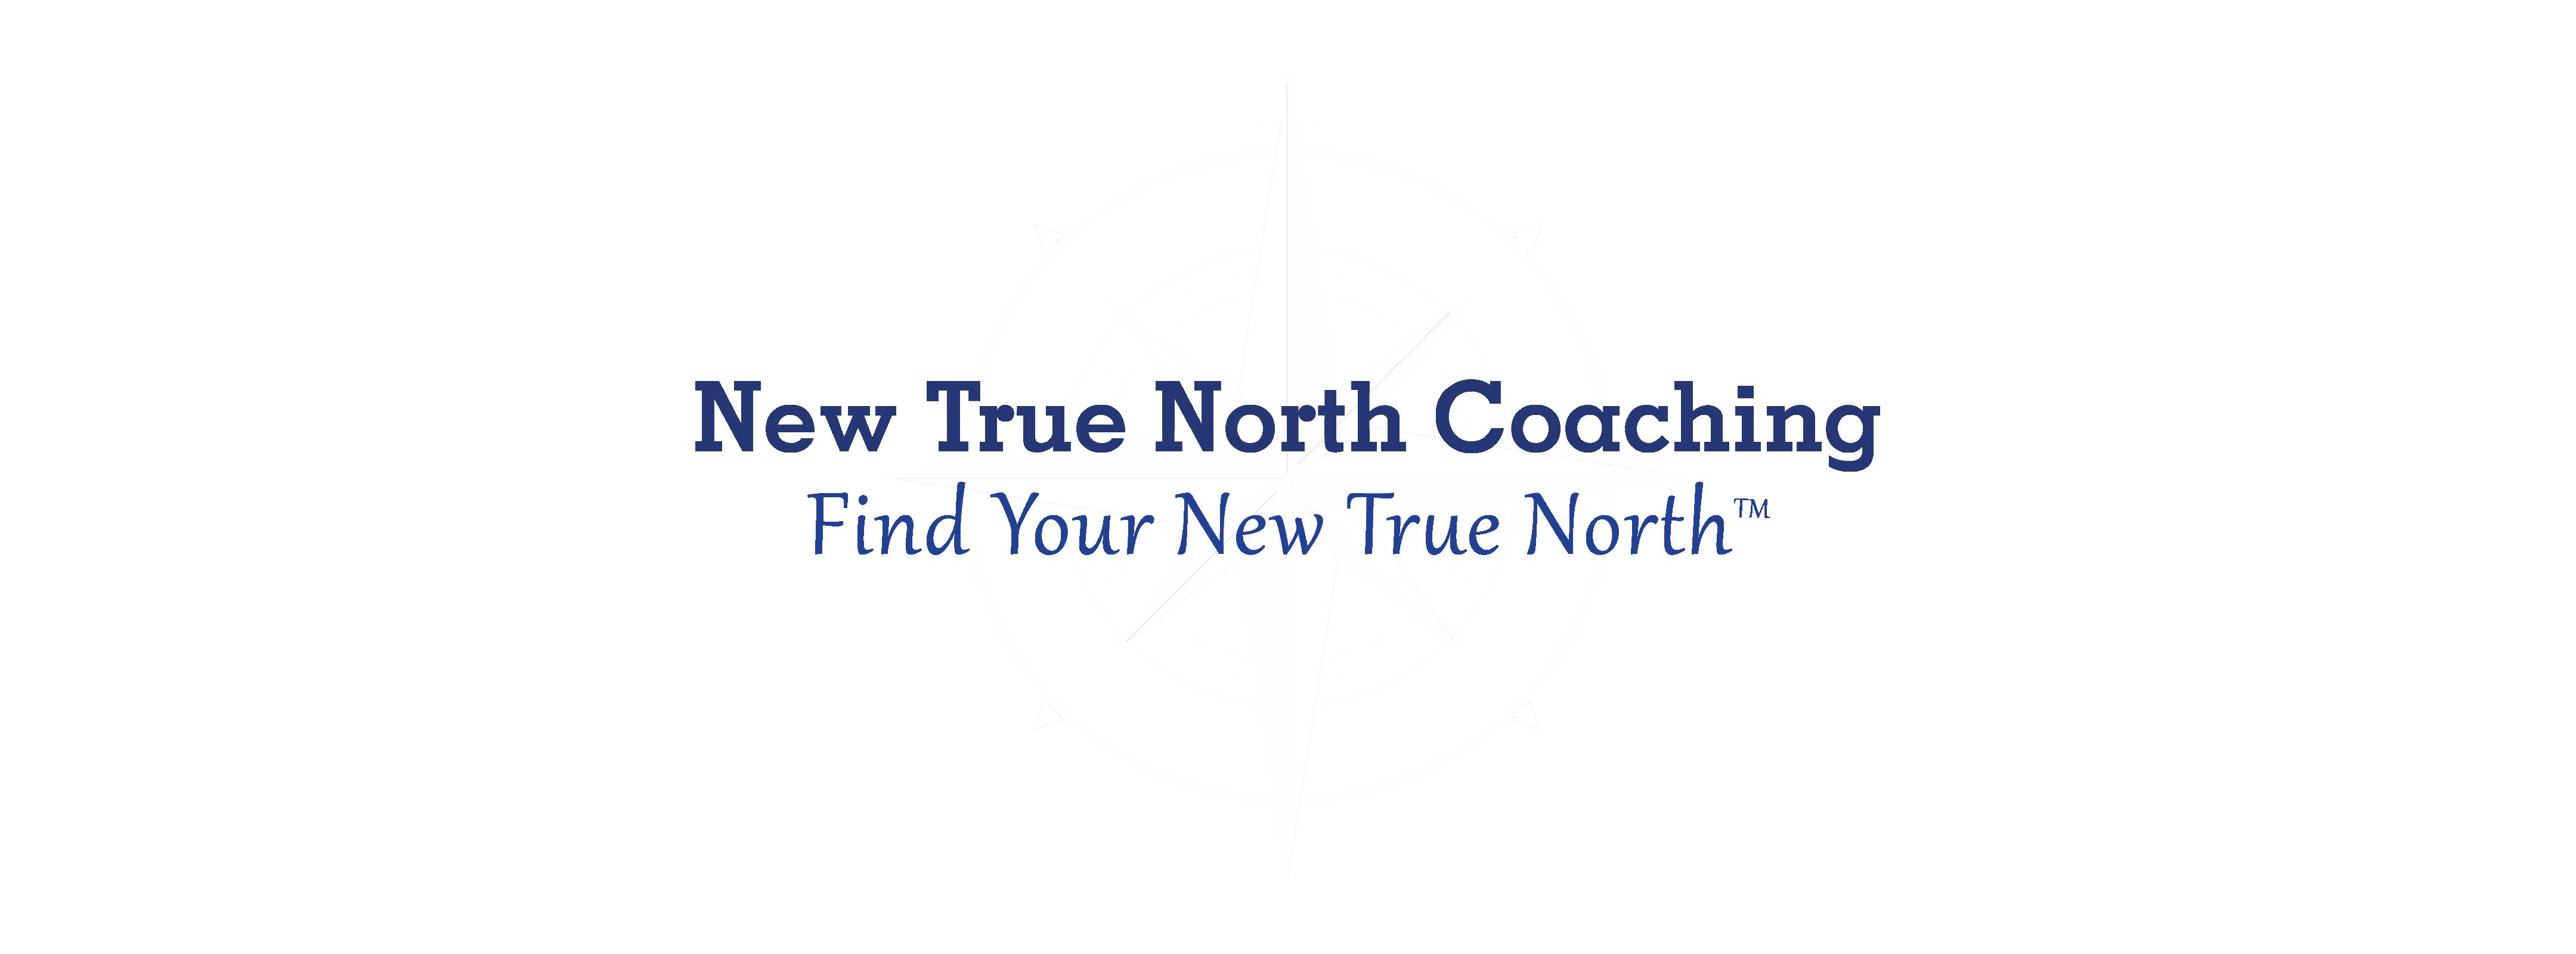 New True North Coaching Logo